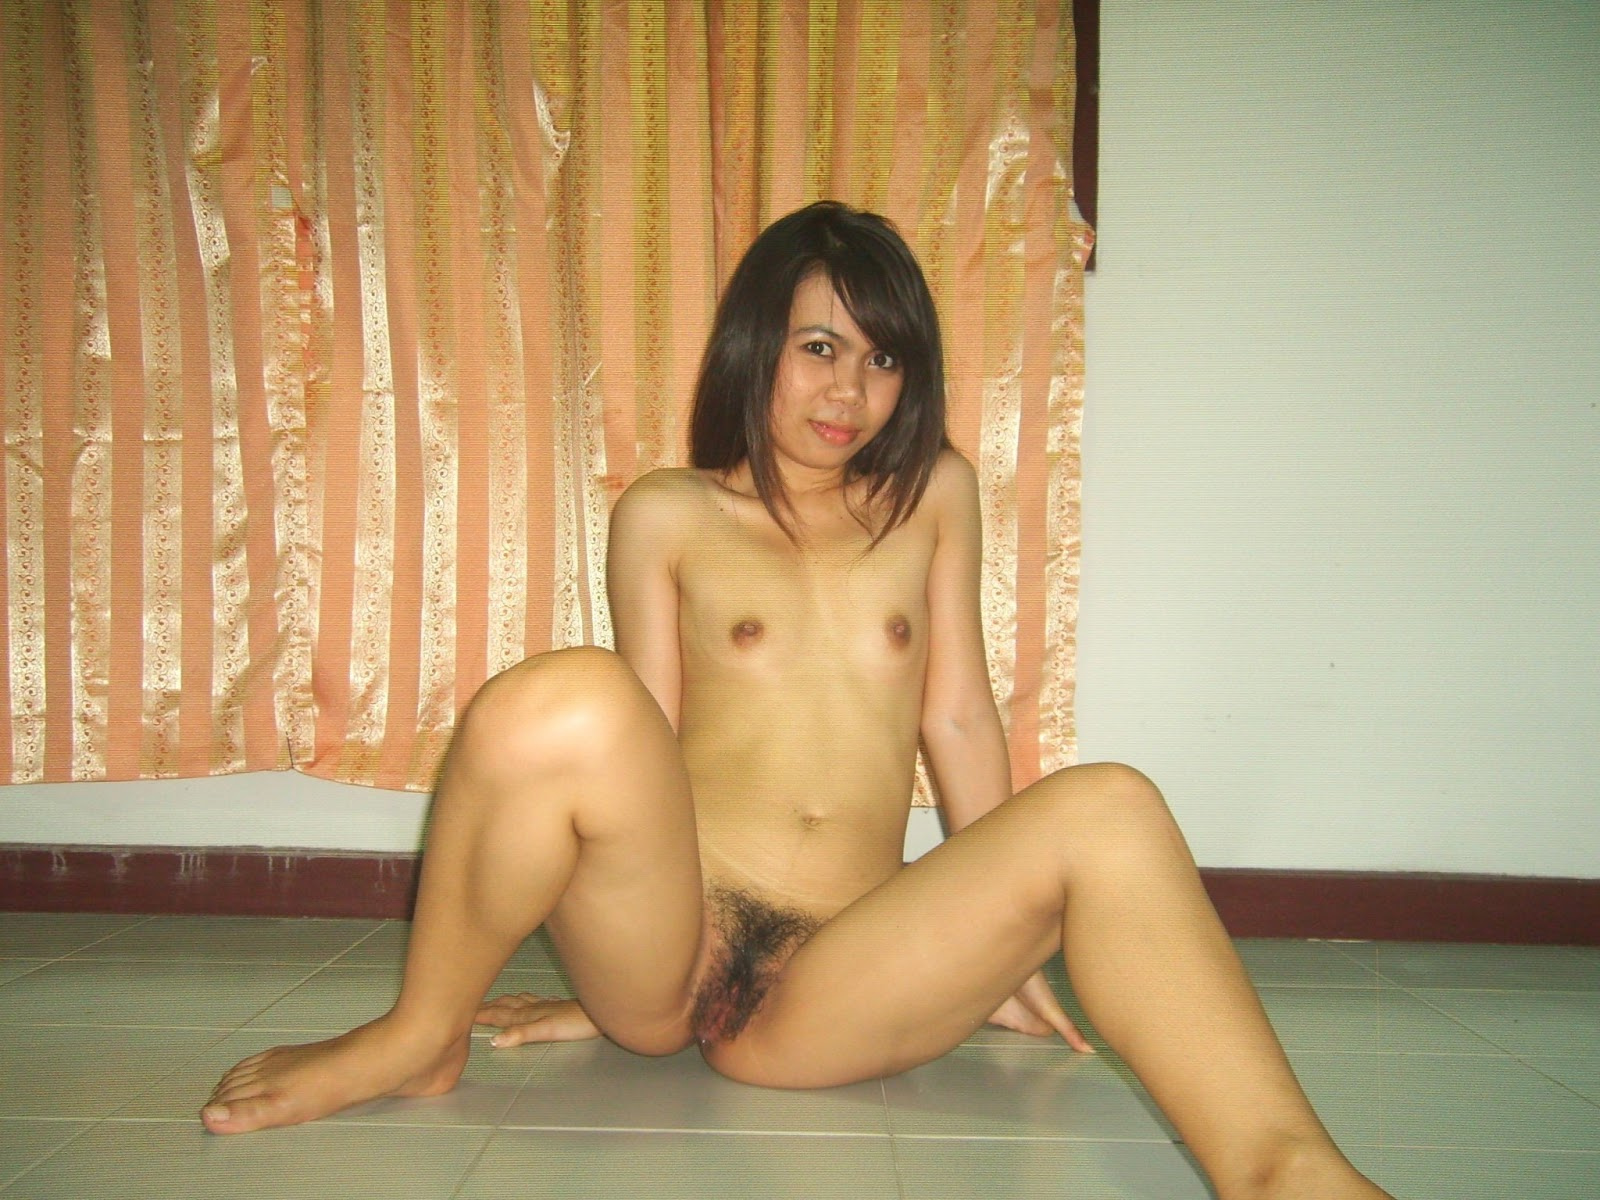 Fad 30 Nude Girl Spreads Her Legs-9782